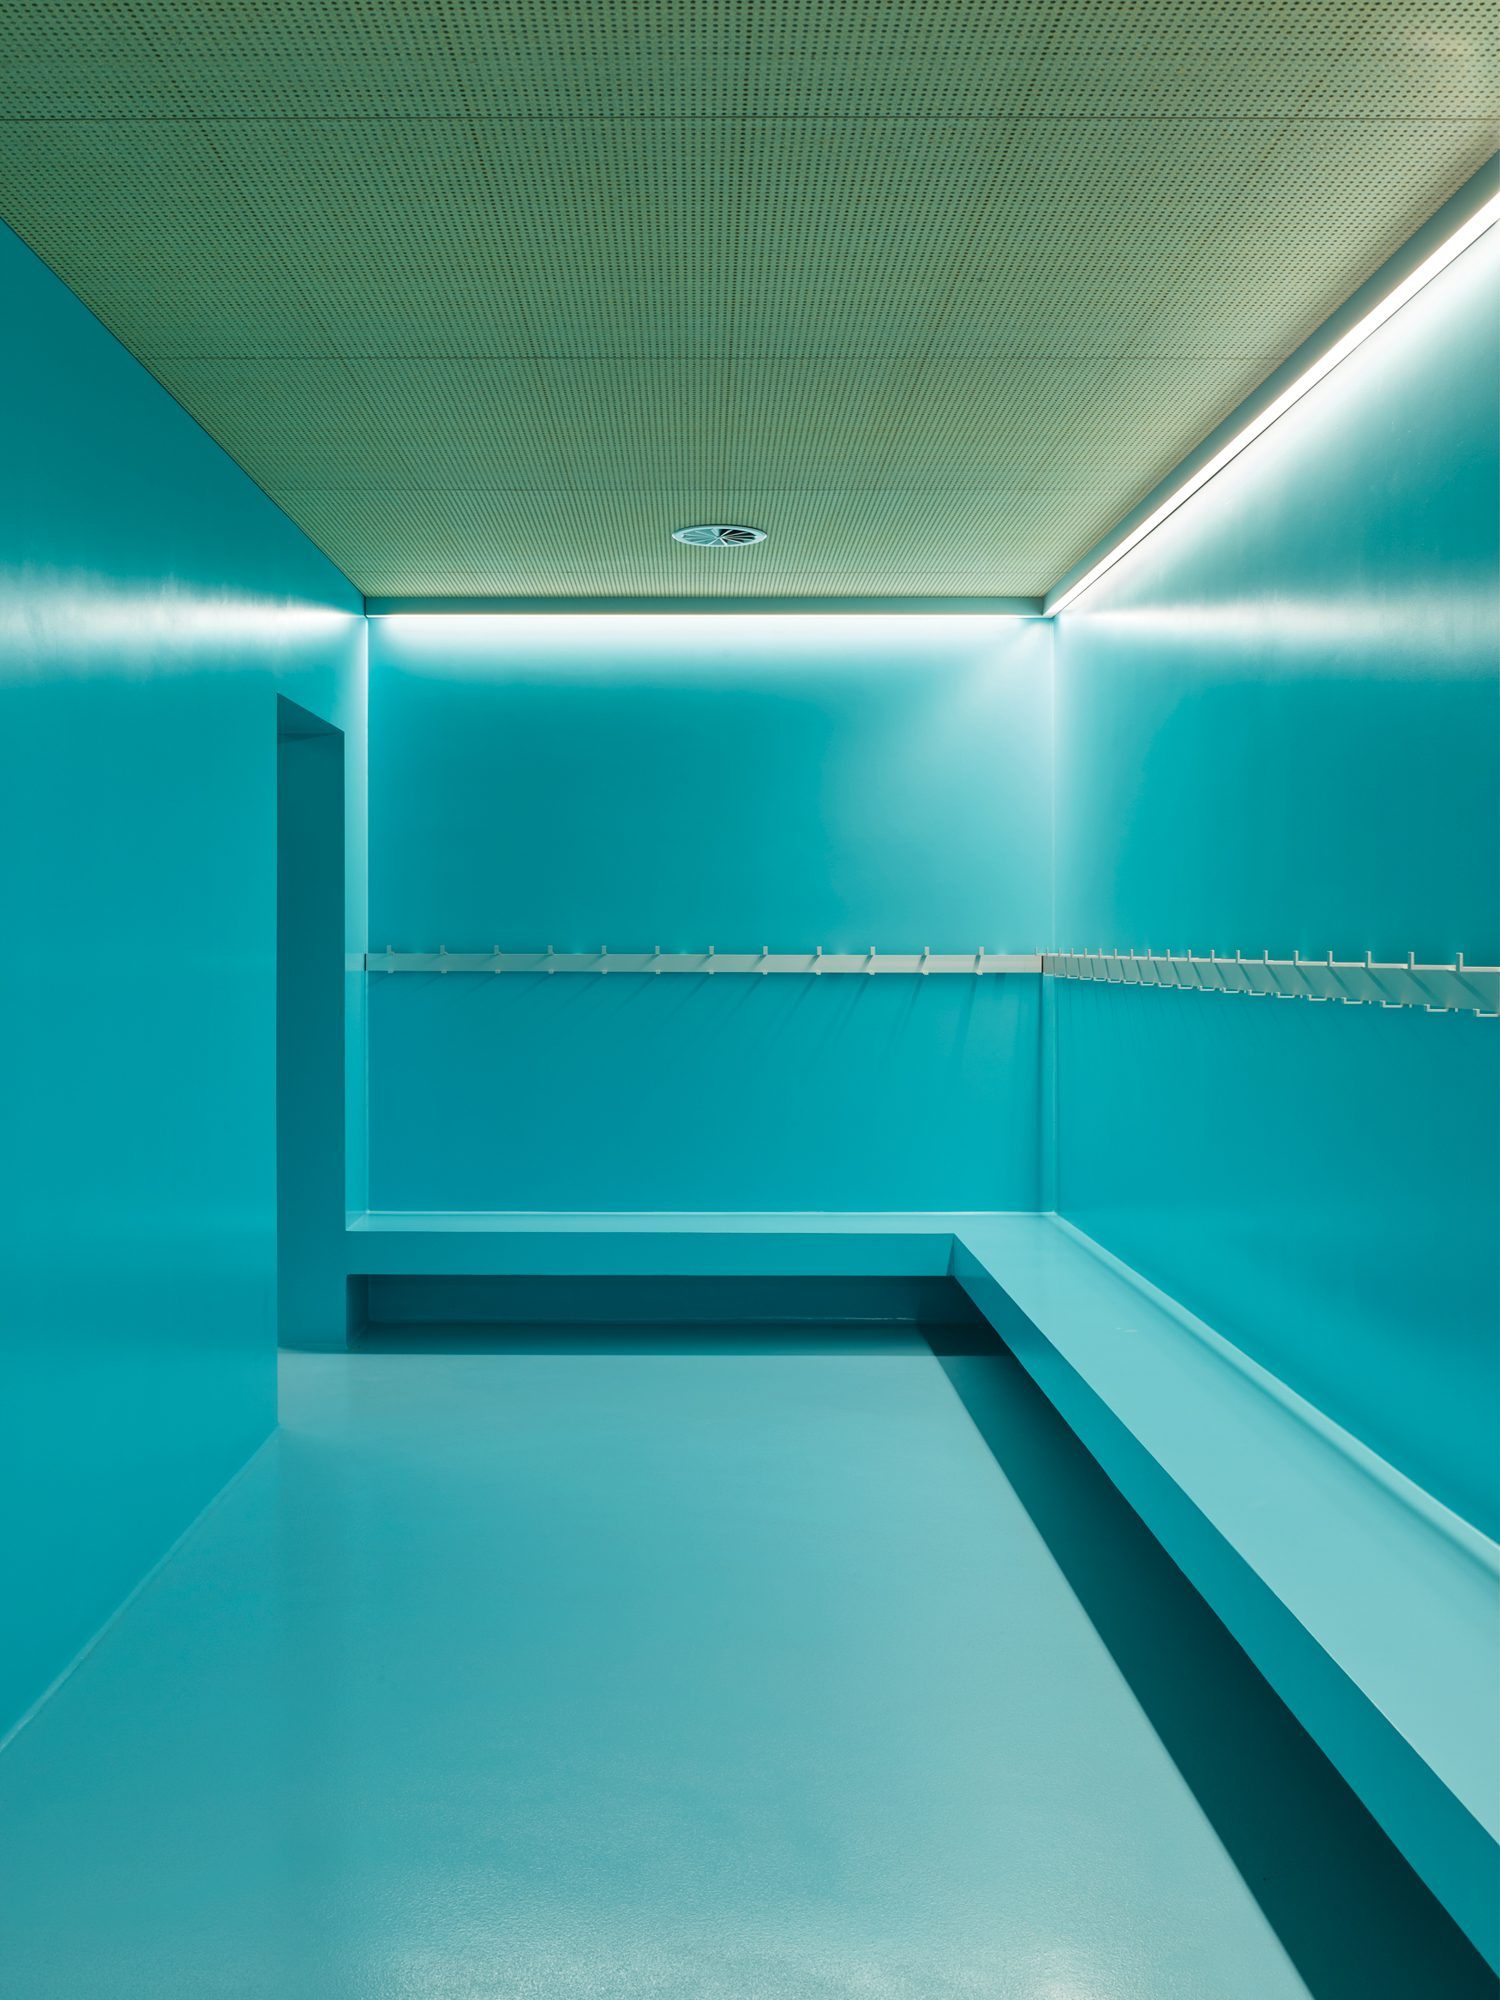 A light blue room.